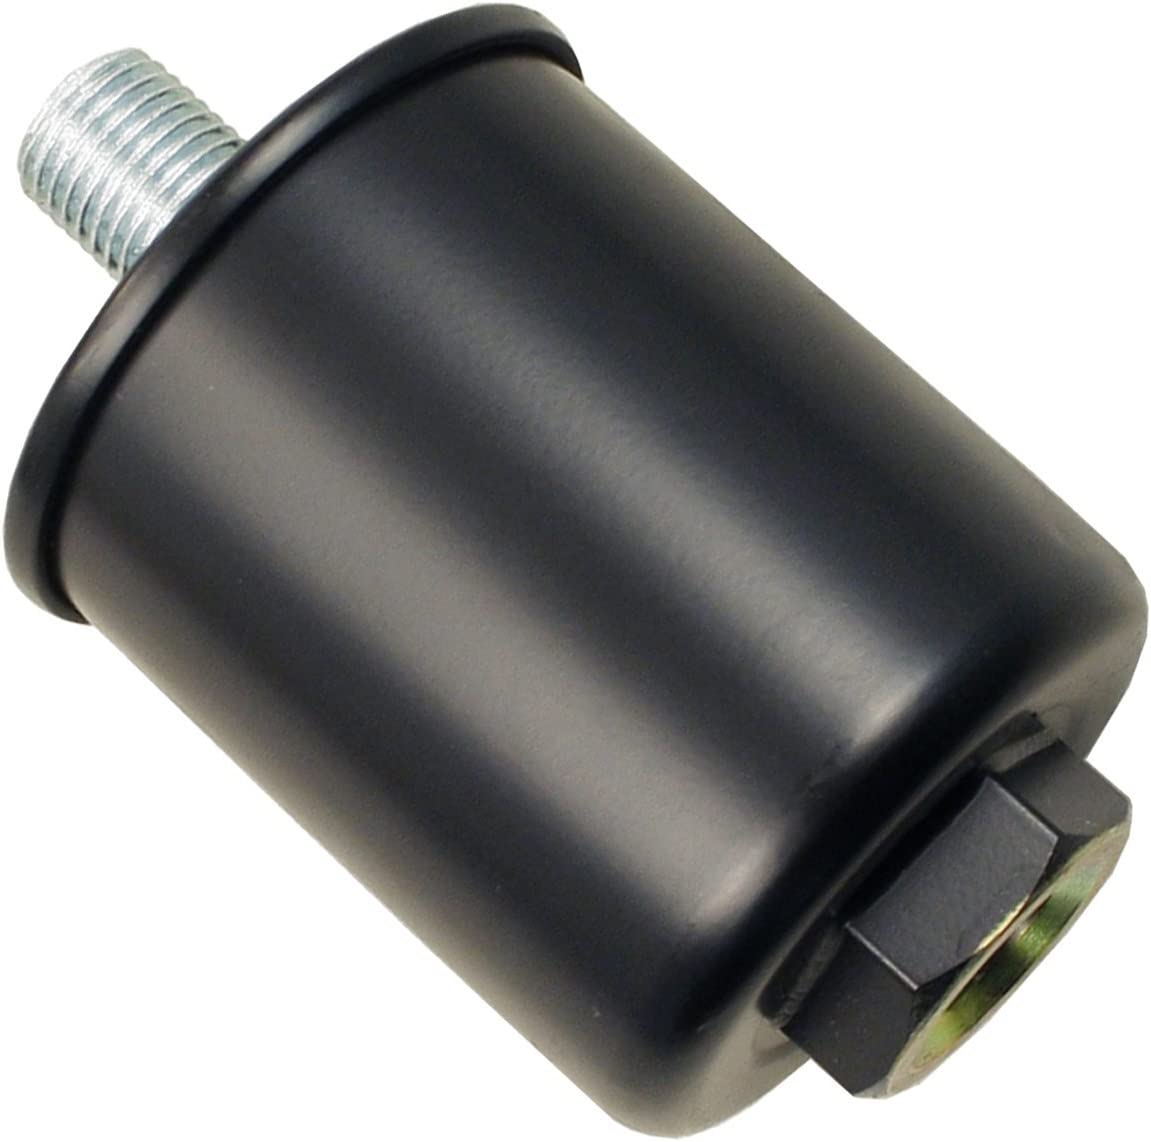 SALENEW very popular! Beck Arnley 044-8003 Award-winning store Automatic Filter Transmission